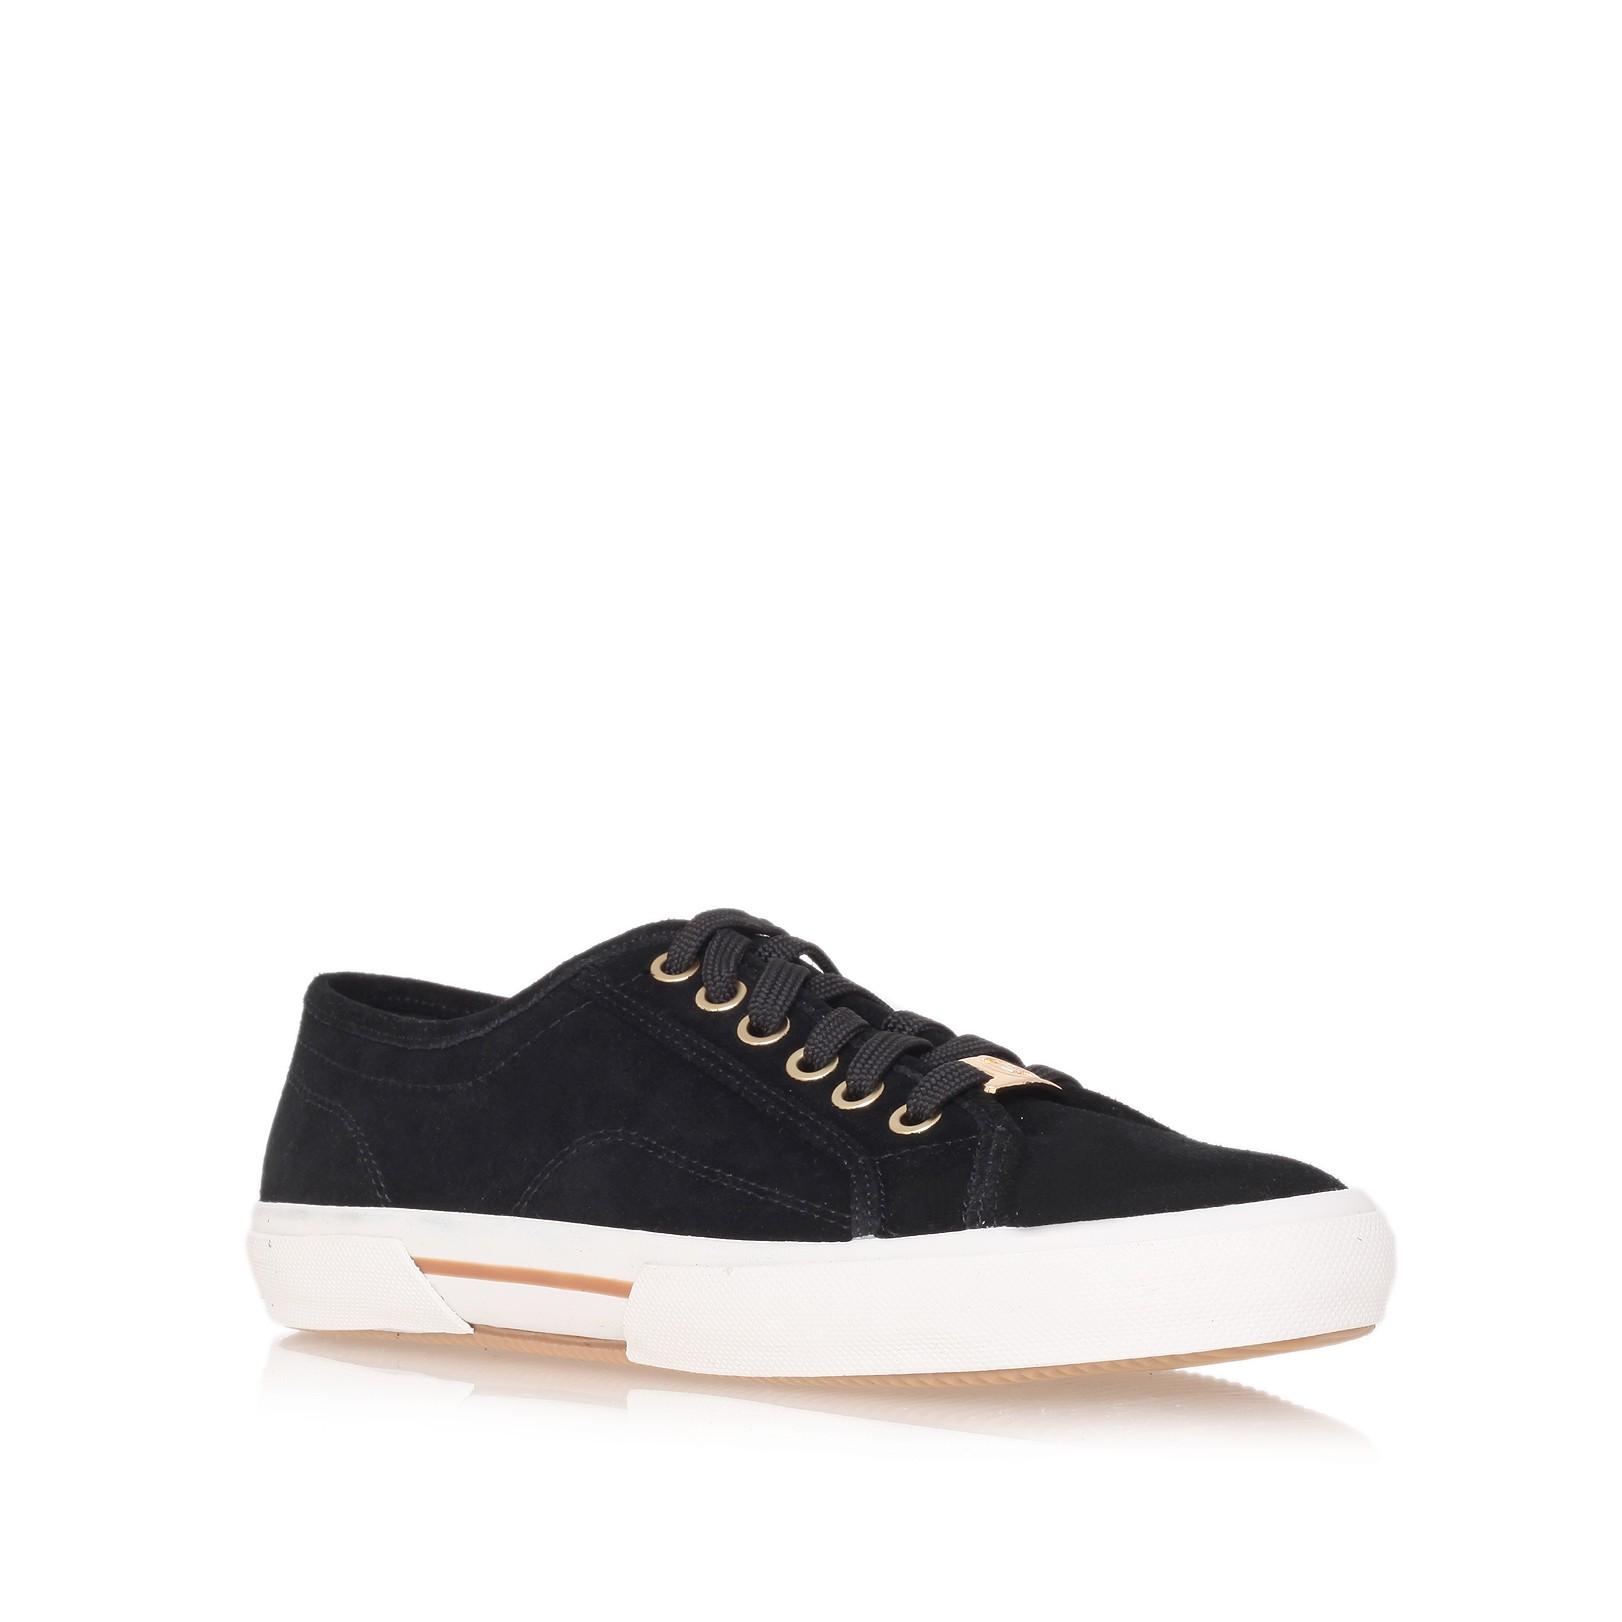 michael michael kors boerum sneaker shoes in black for men. Black Bedroom Furniture Sets. Home Design Ideas